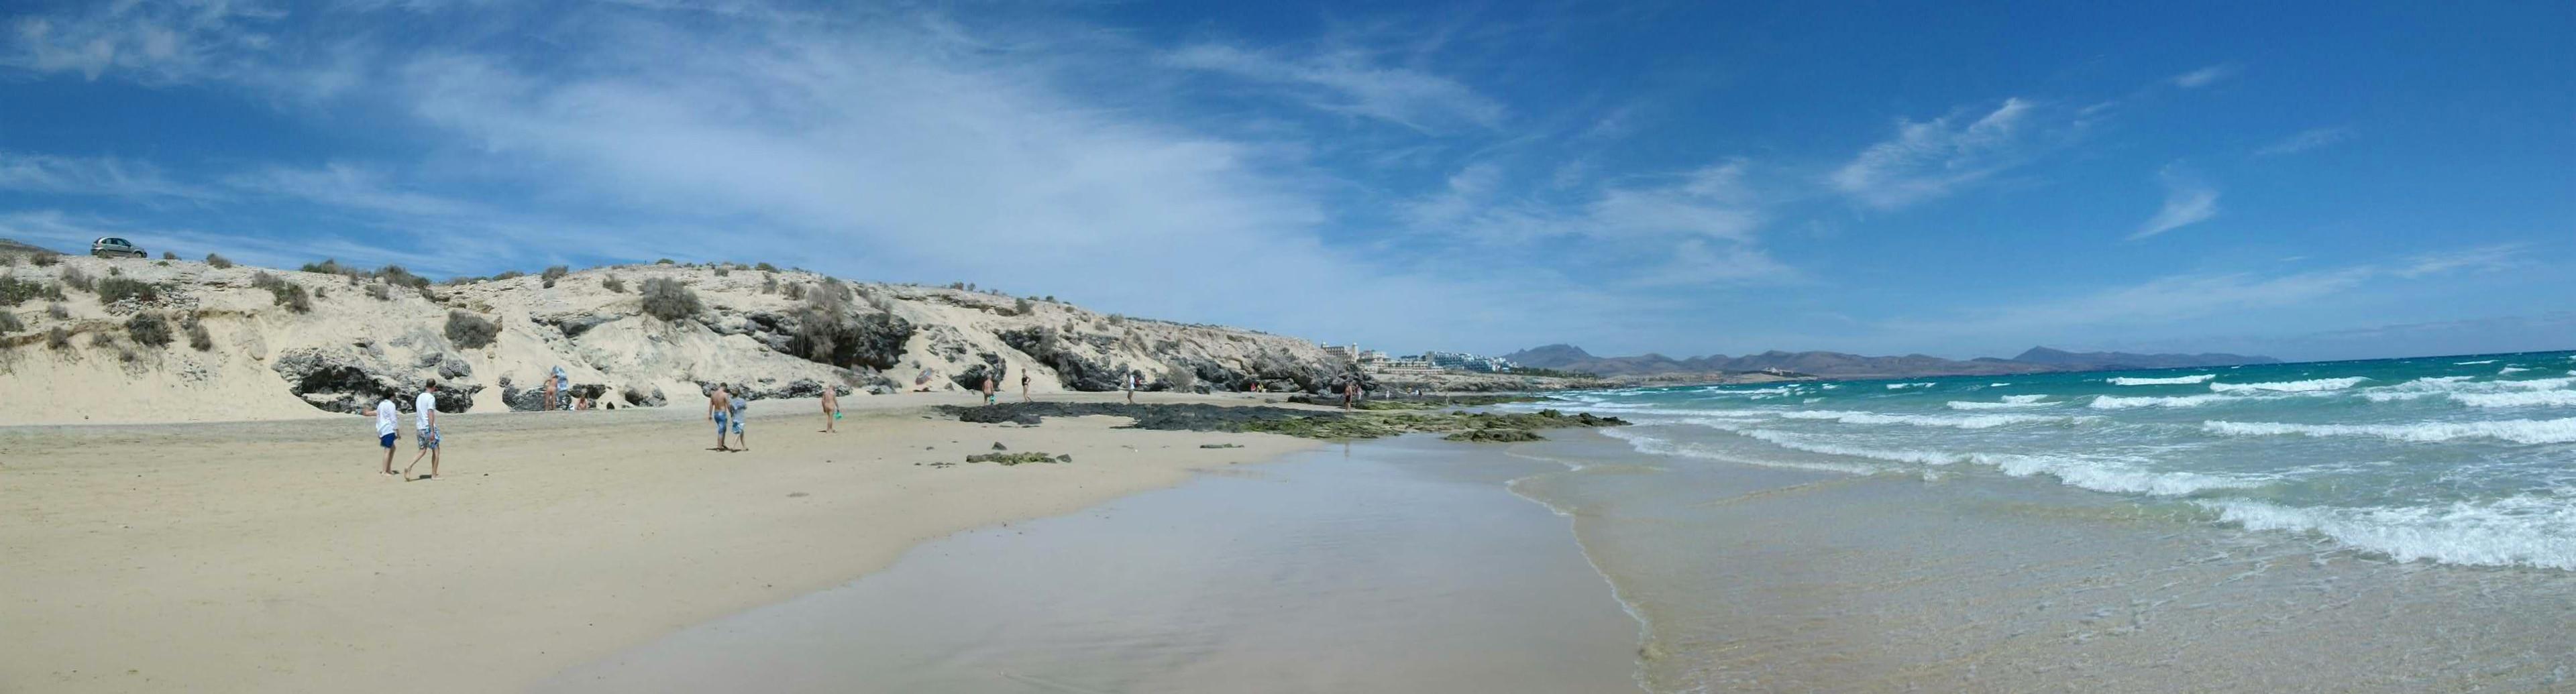 Playa Esmeralda South, Pajara, Canary Islands, Spain